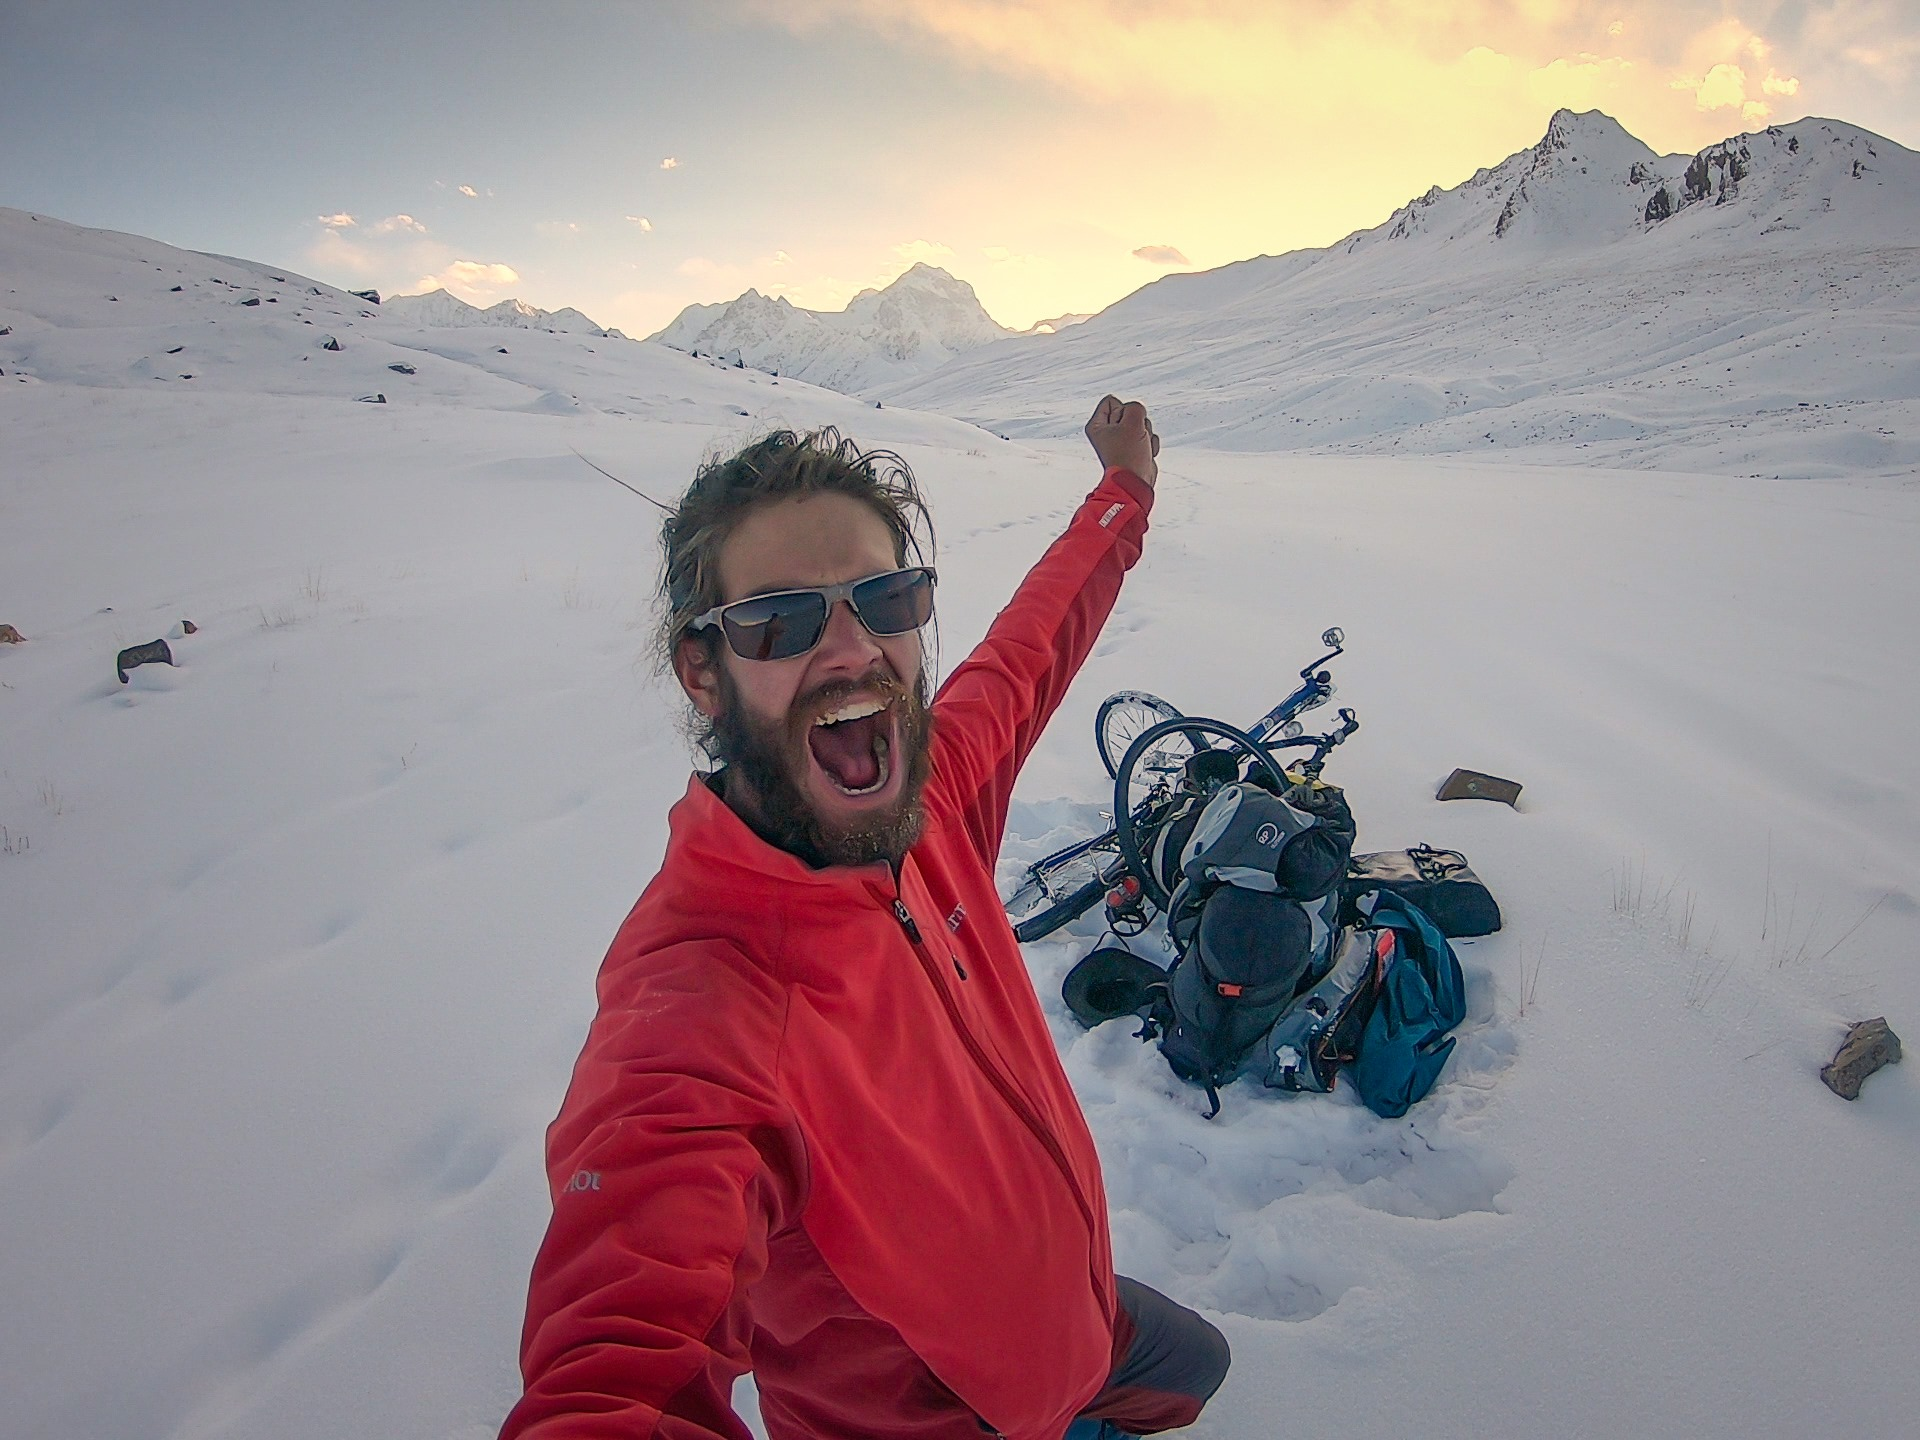 Hungarian Adventurer Follows Sándor Kőrösi Csoma's Way to Tibet, Imprisoned in Pakistan